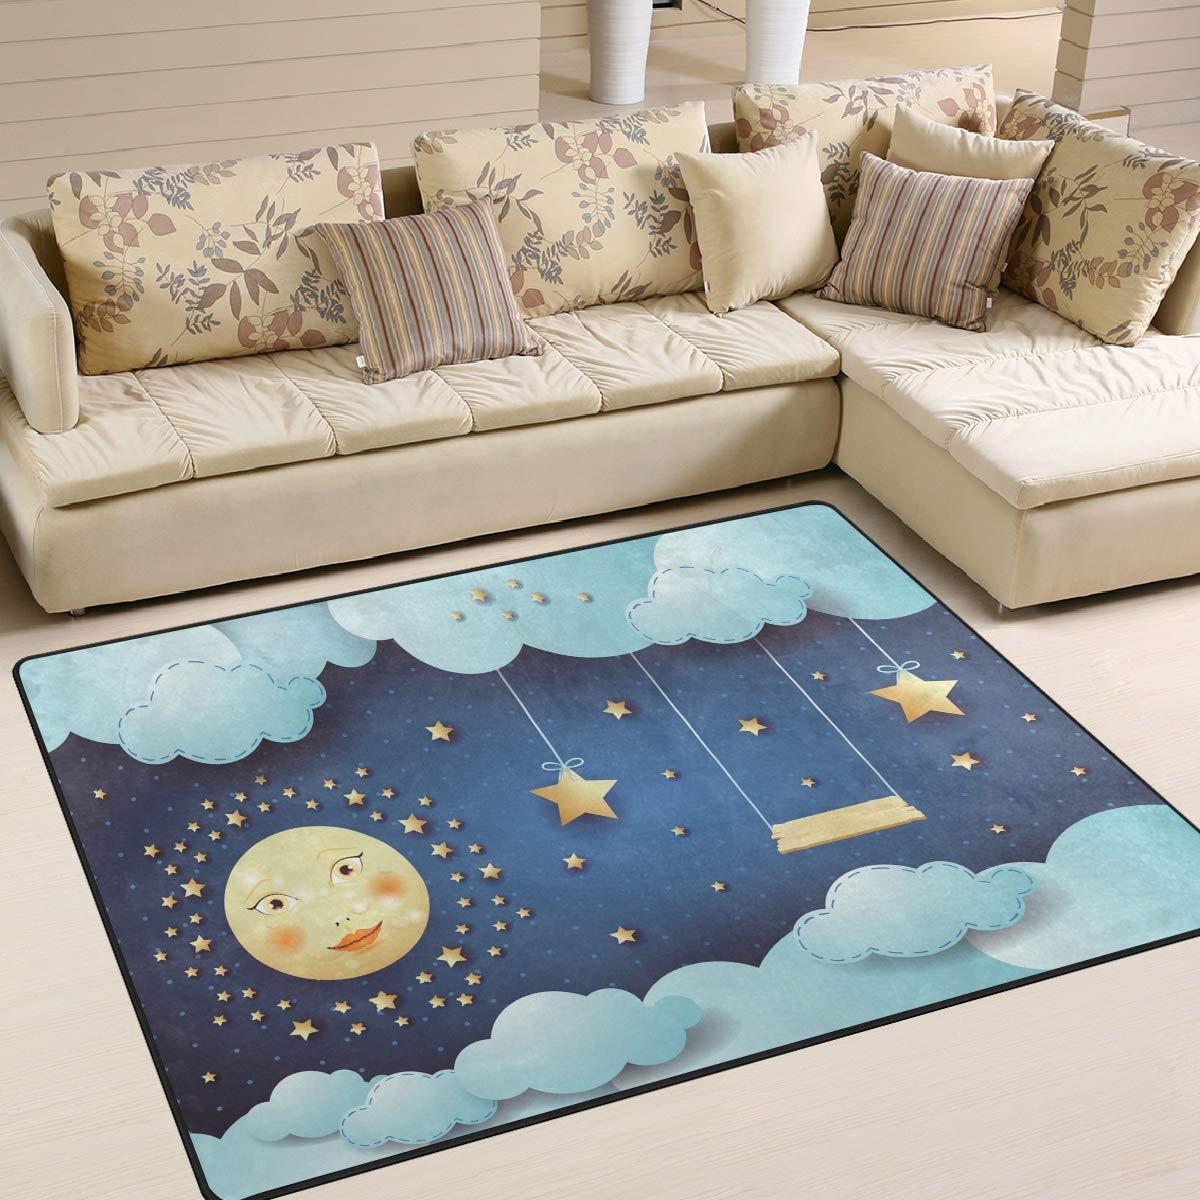 ALAZA Surreal Night with Full Moon Hanging Stars and Swing Indoor Modern Area Rug 4' x 5', Dining Room Home Bedroom Carpet Floor Mat Nursery Rug Room Mat